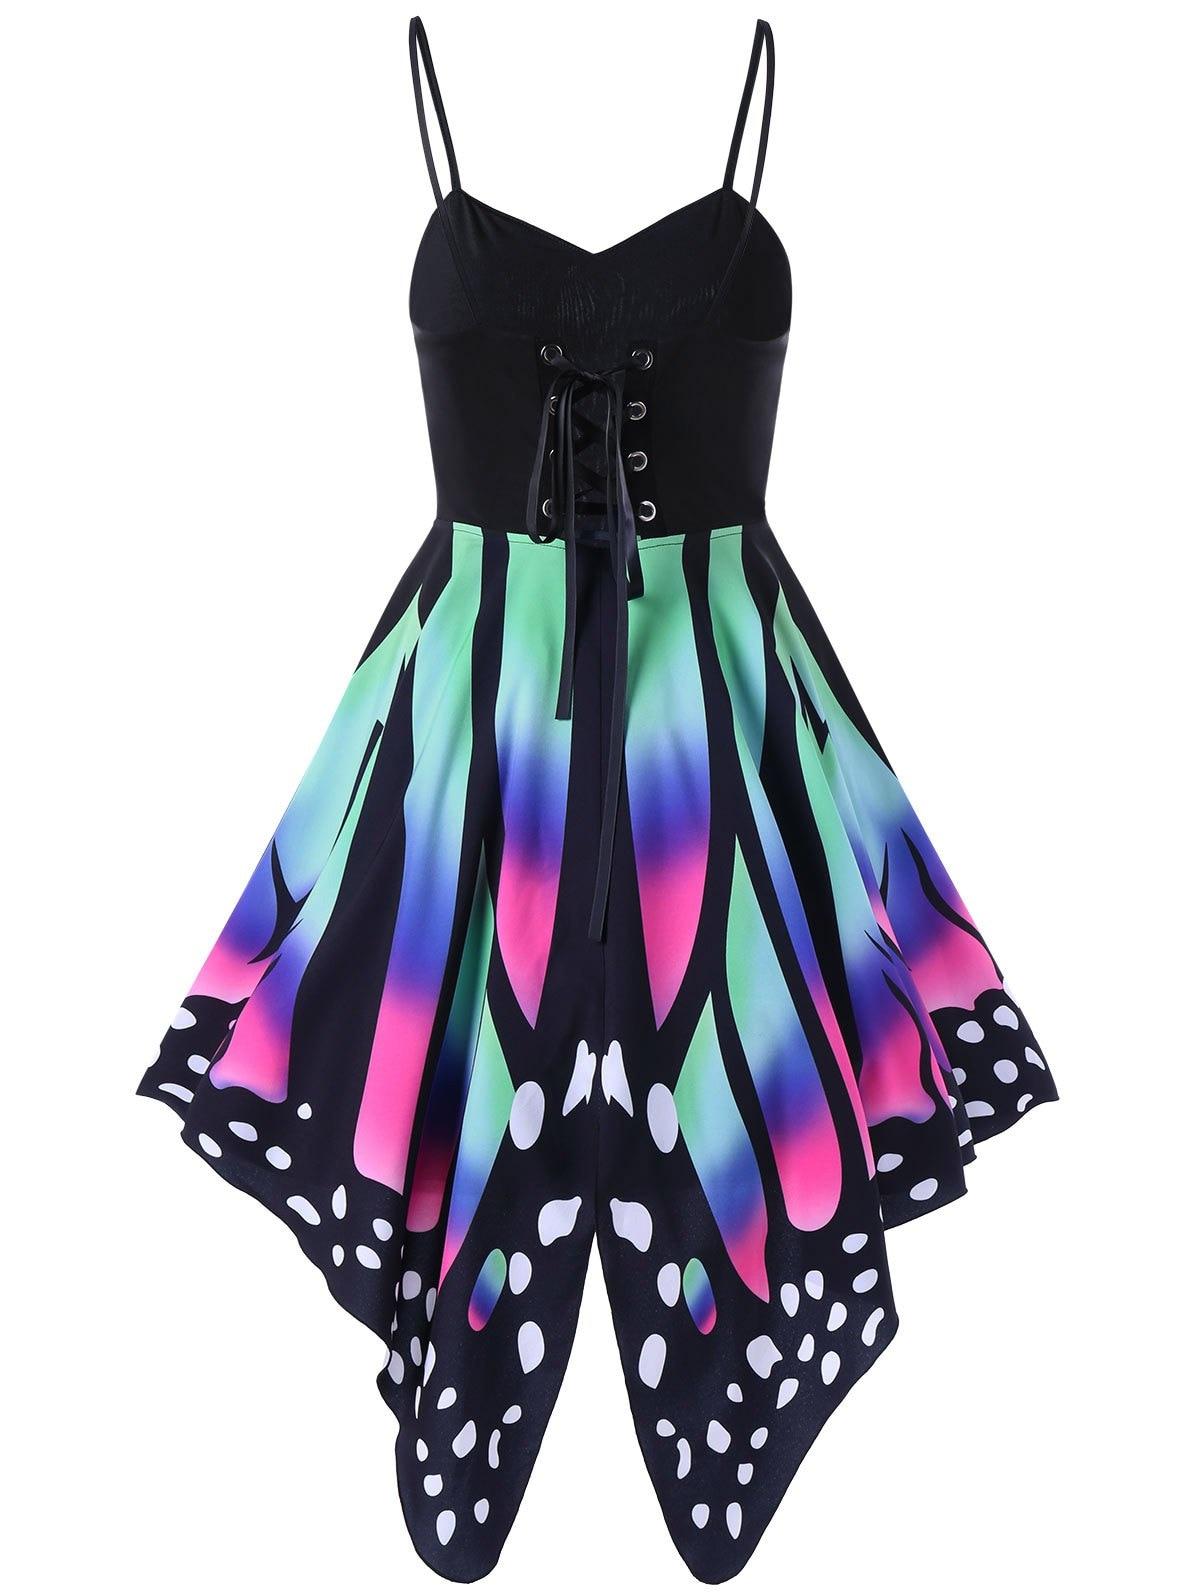 Wipalo 2018 Summer High Waist Butterfly Print Lace Up Slip Dress Sleeveless Knee Length Vintage Cami Dress Vestido De Femme Robe